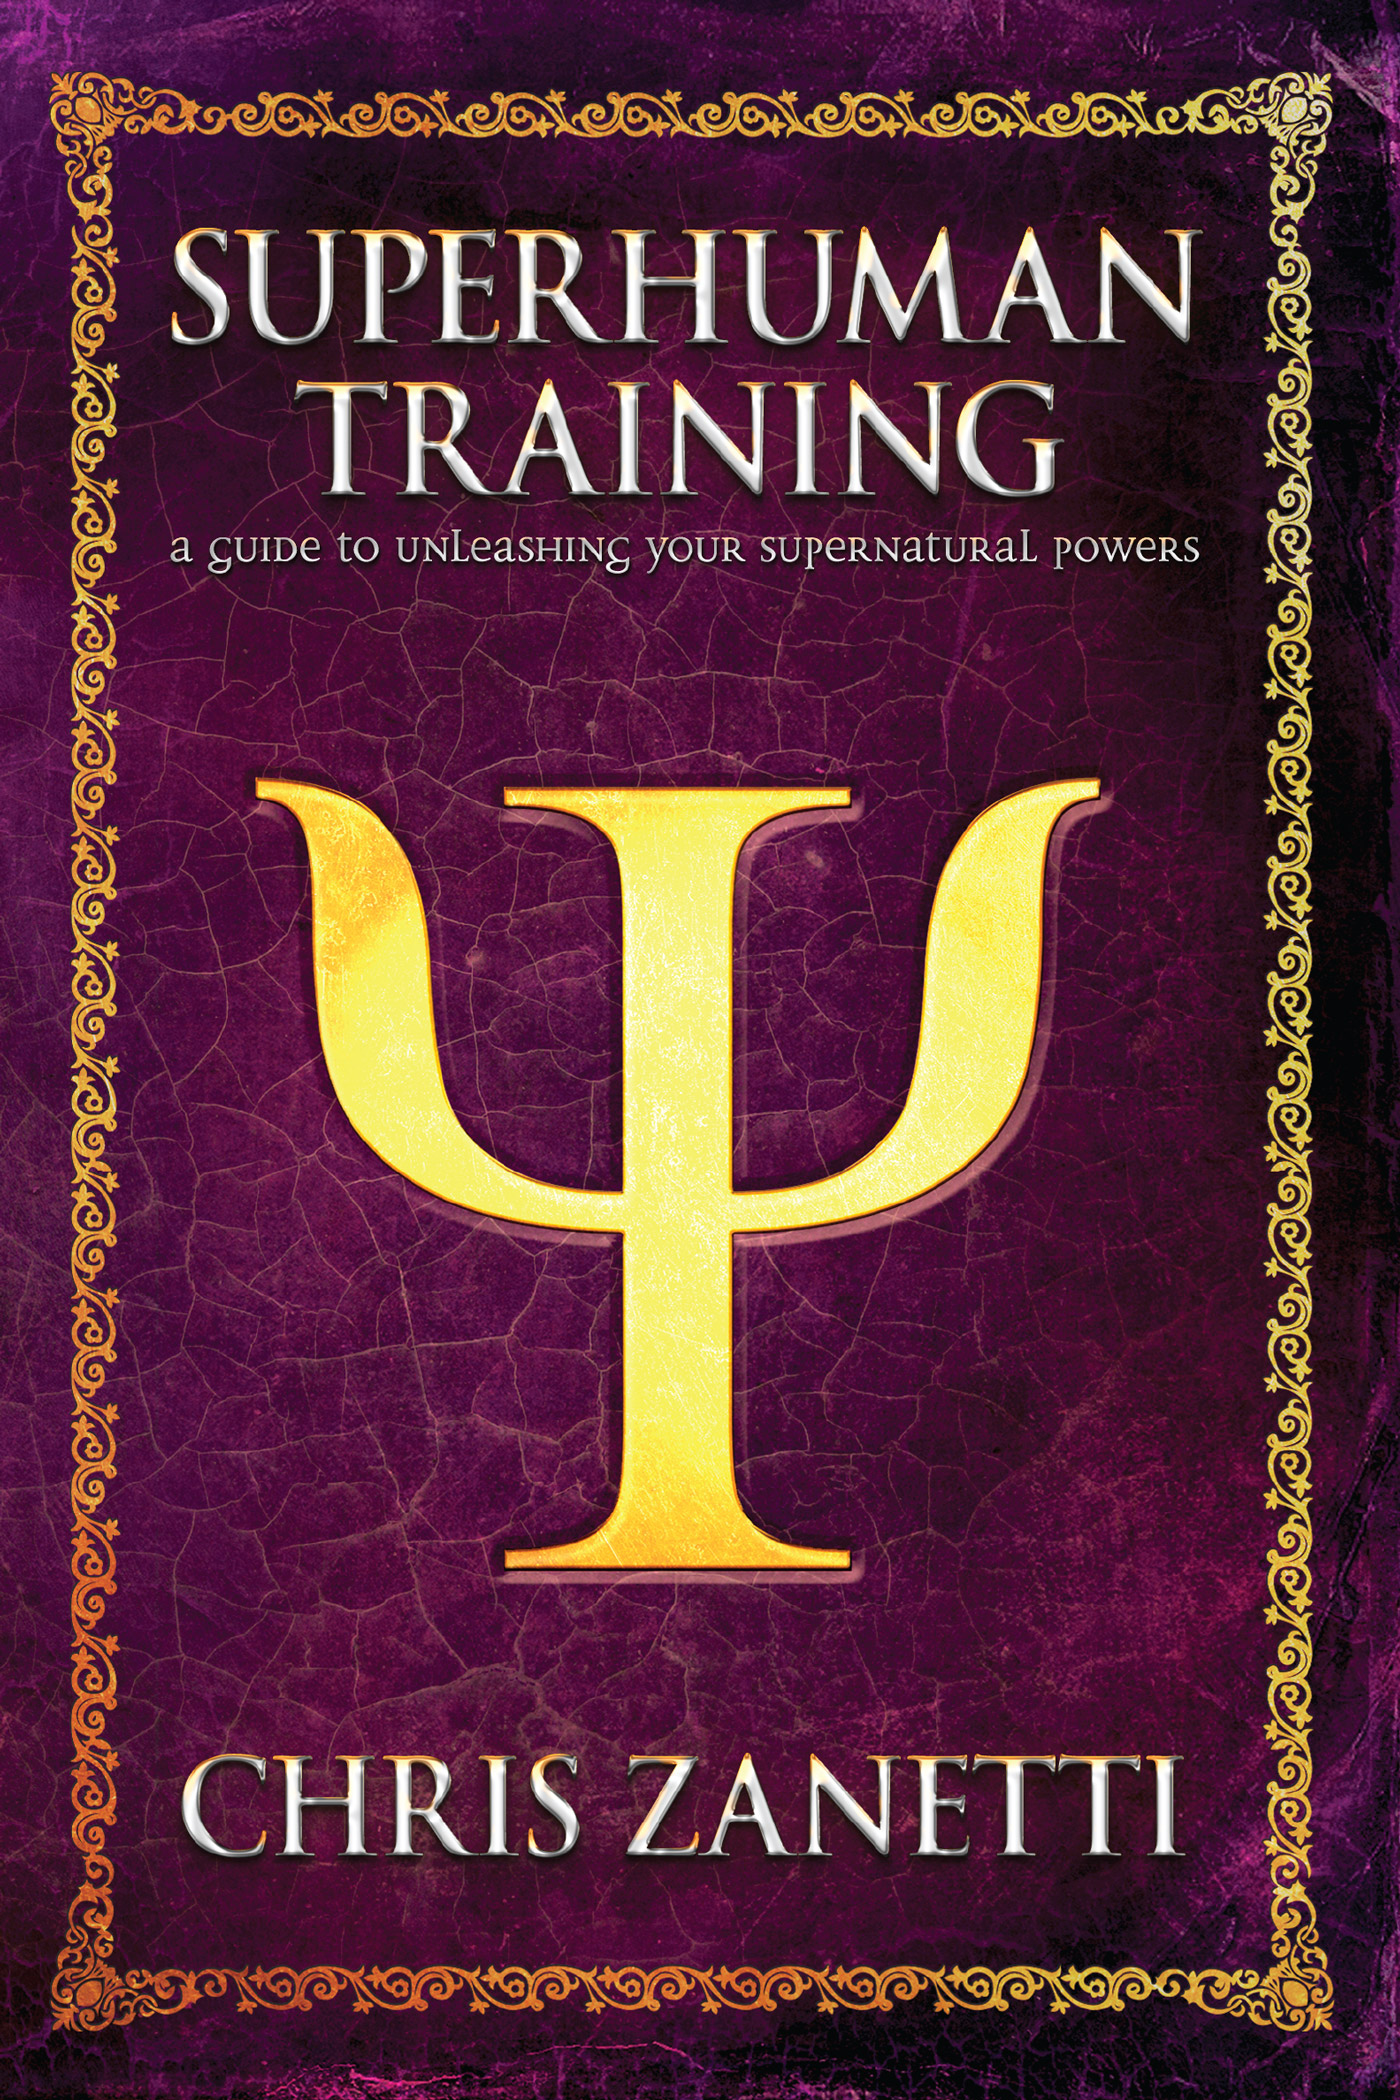 Superhuman Training, an Ebook by Chris Zanetti